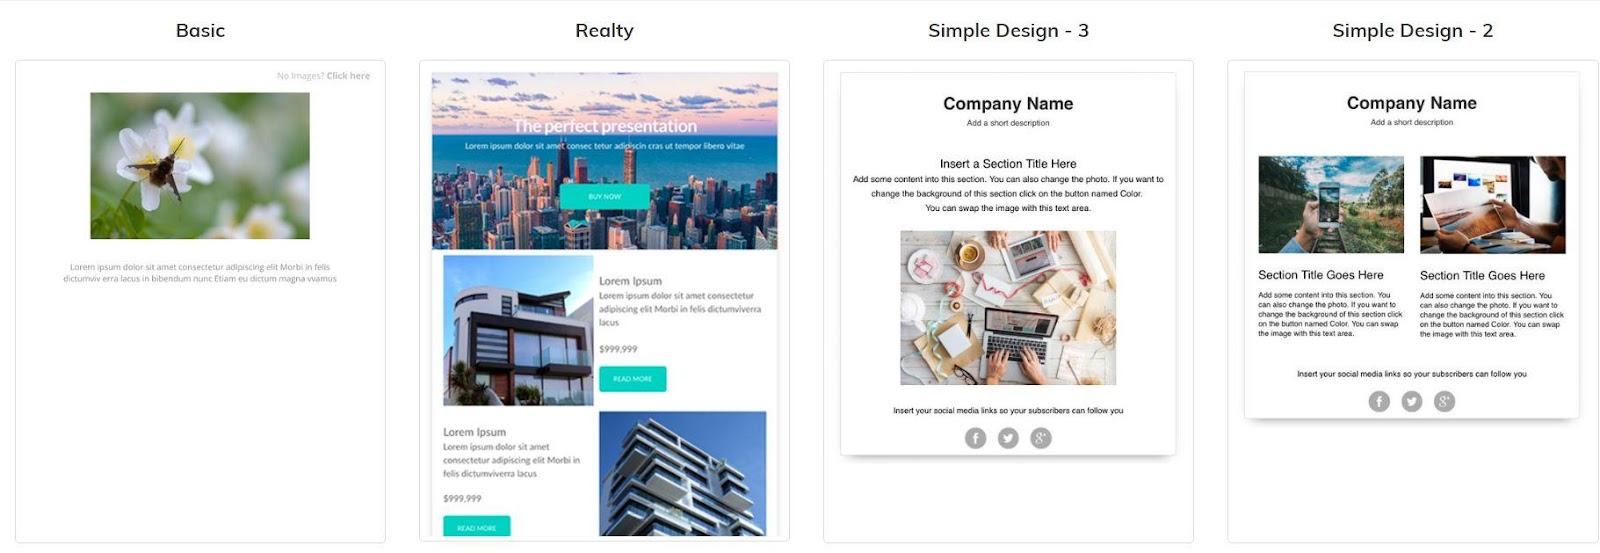 design templates in VerticalResponse